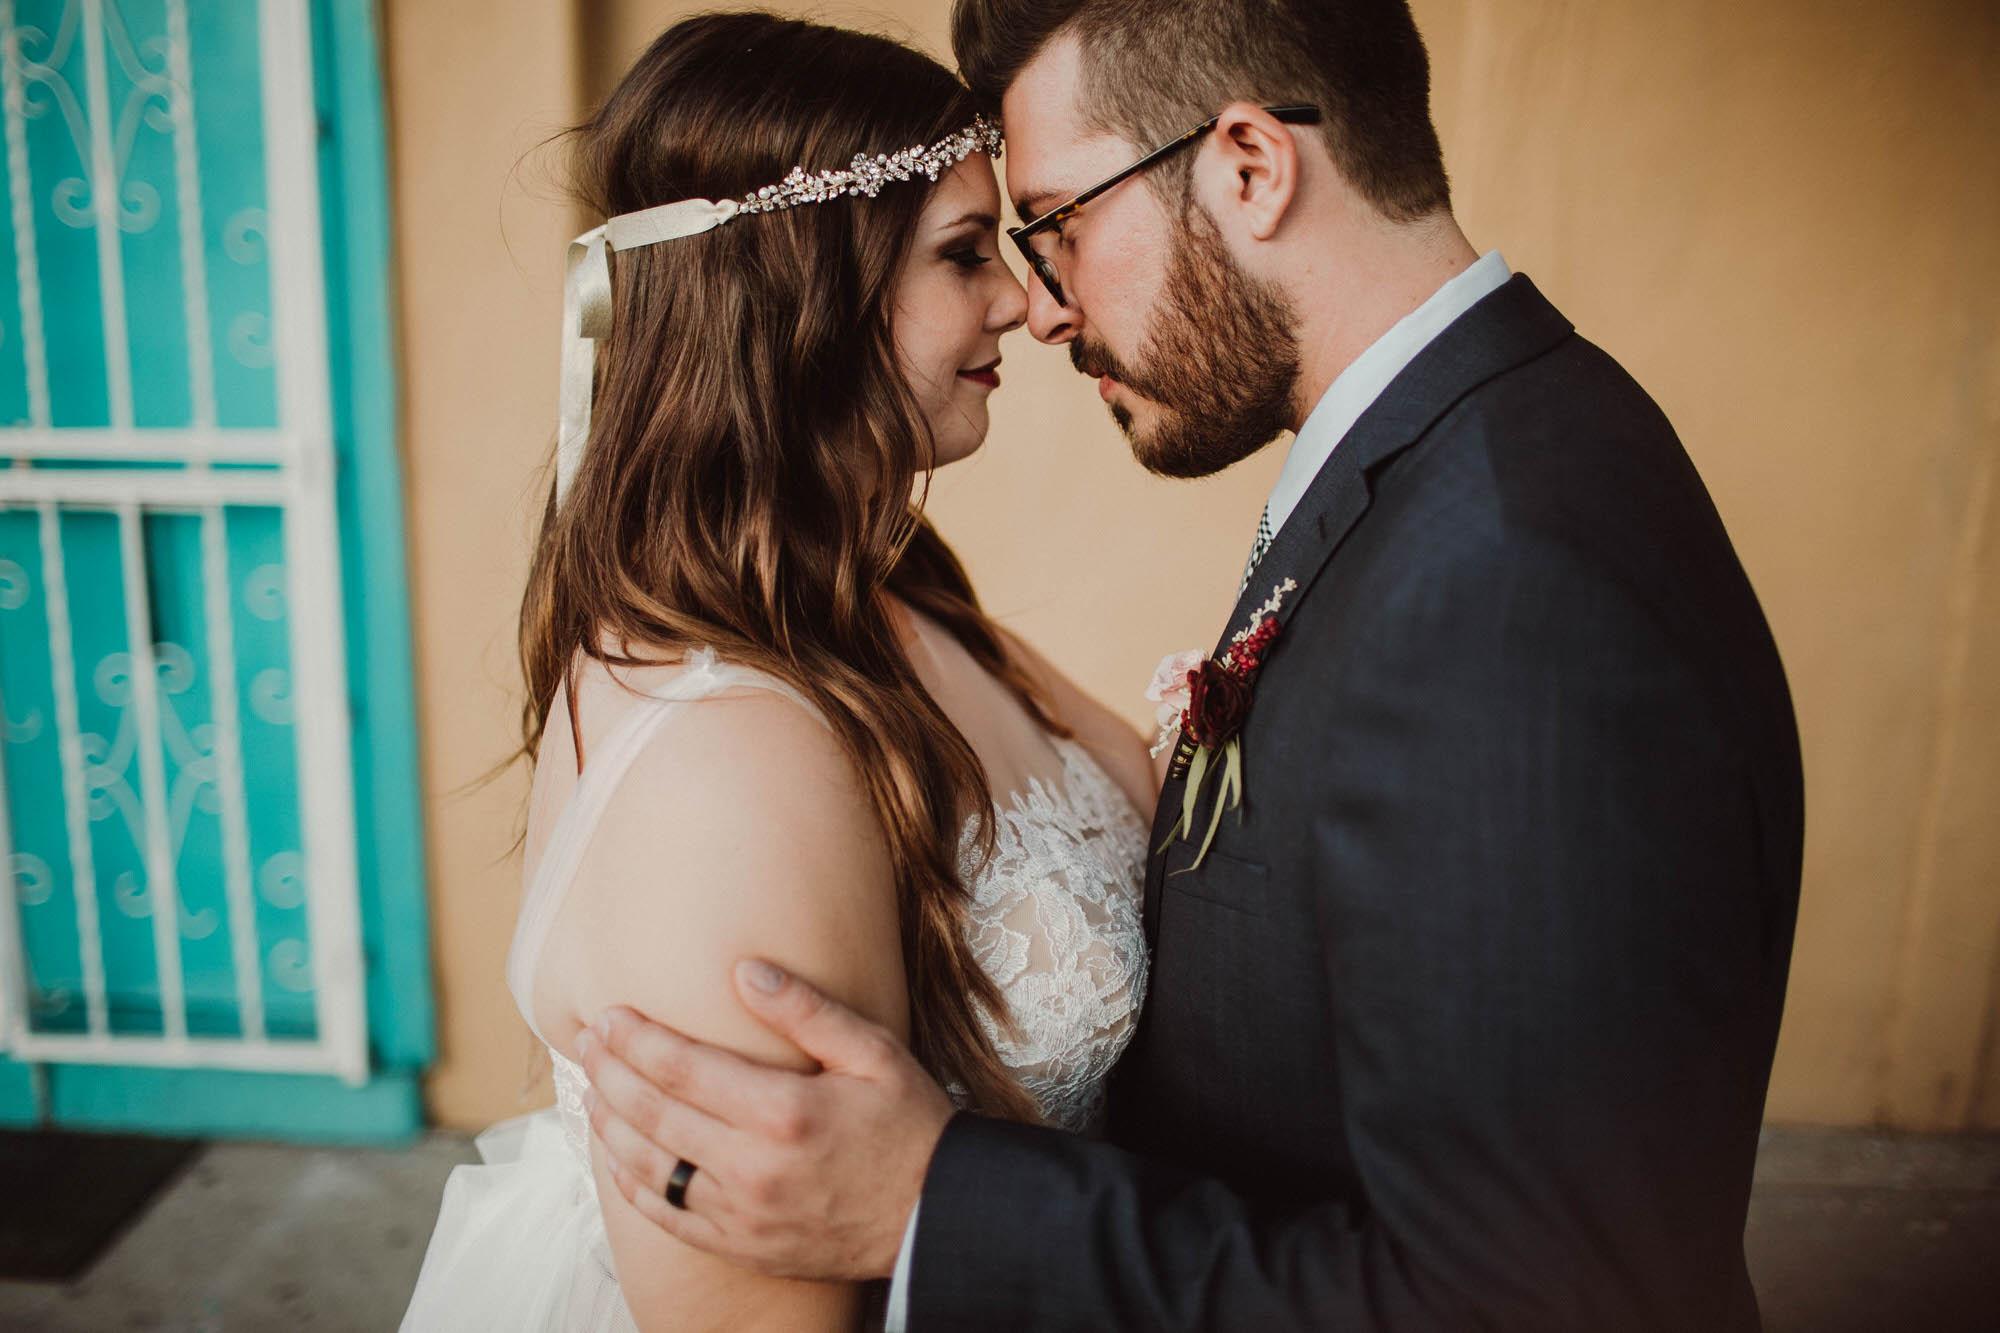 los-angeles-wedding-photographer-kristen-dylan-74.jpg